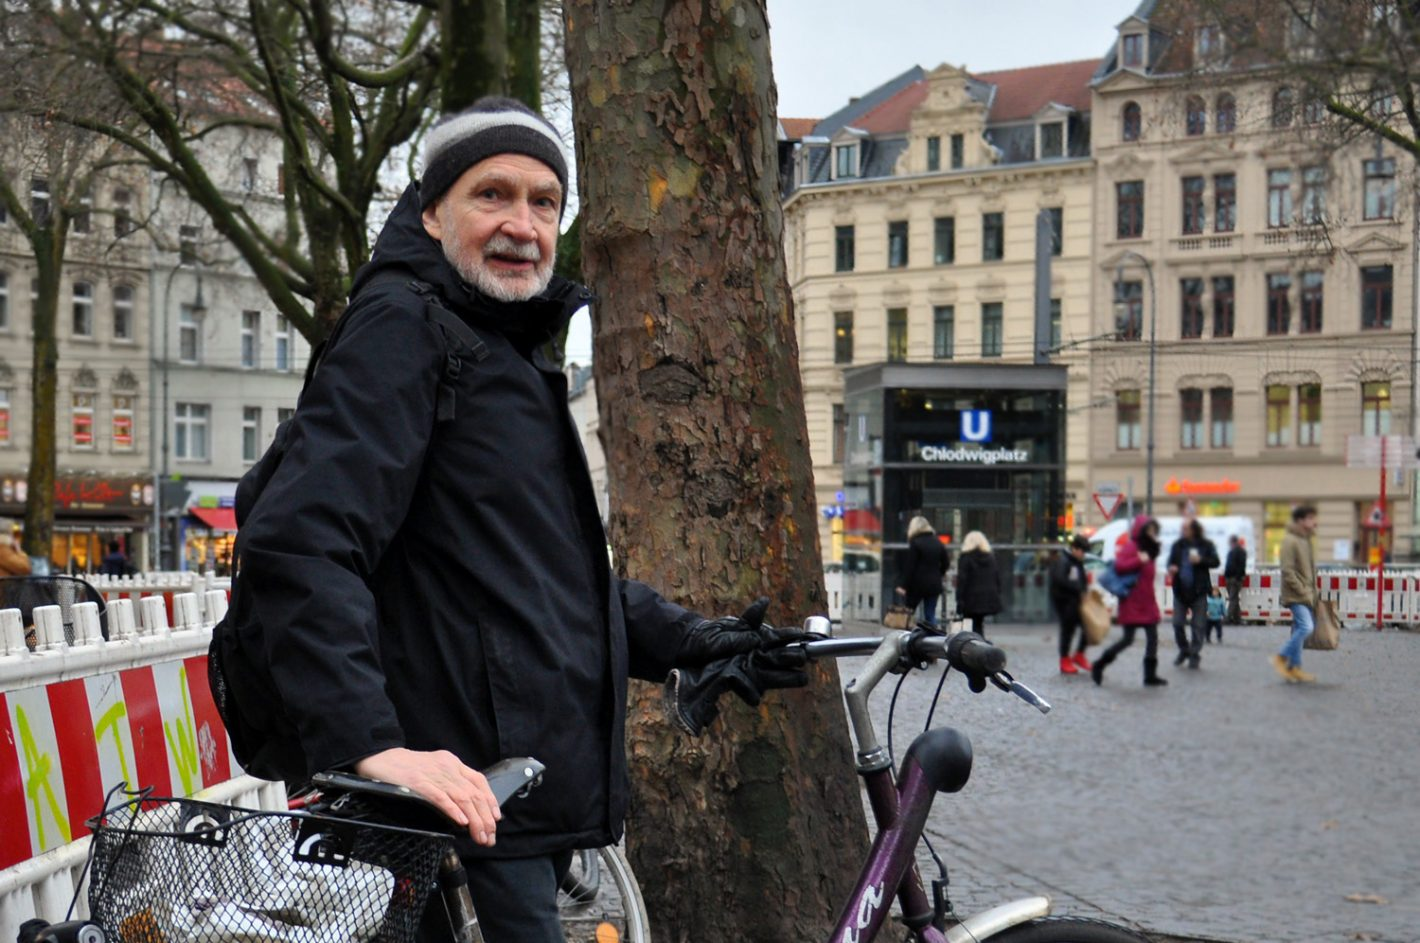 Mann mit Fahrrad am Chlodwigplatz